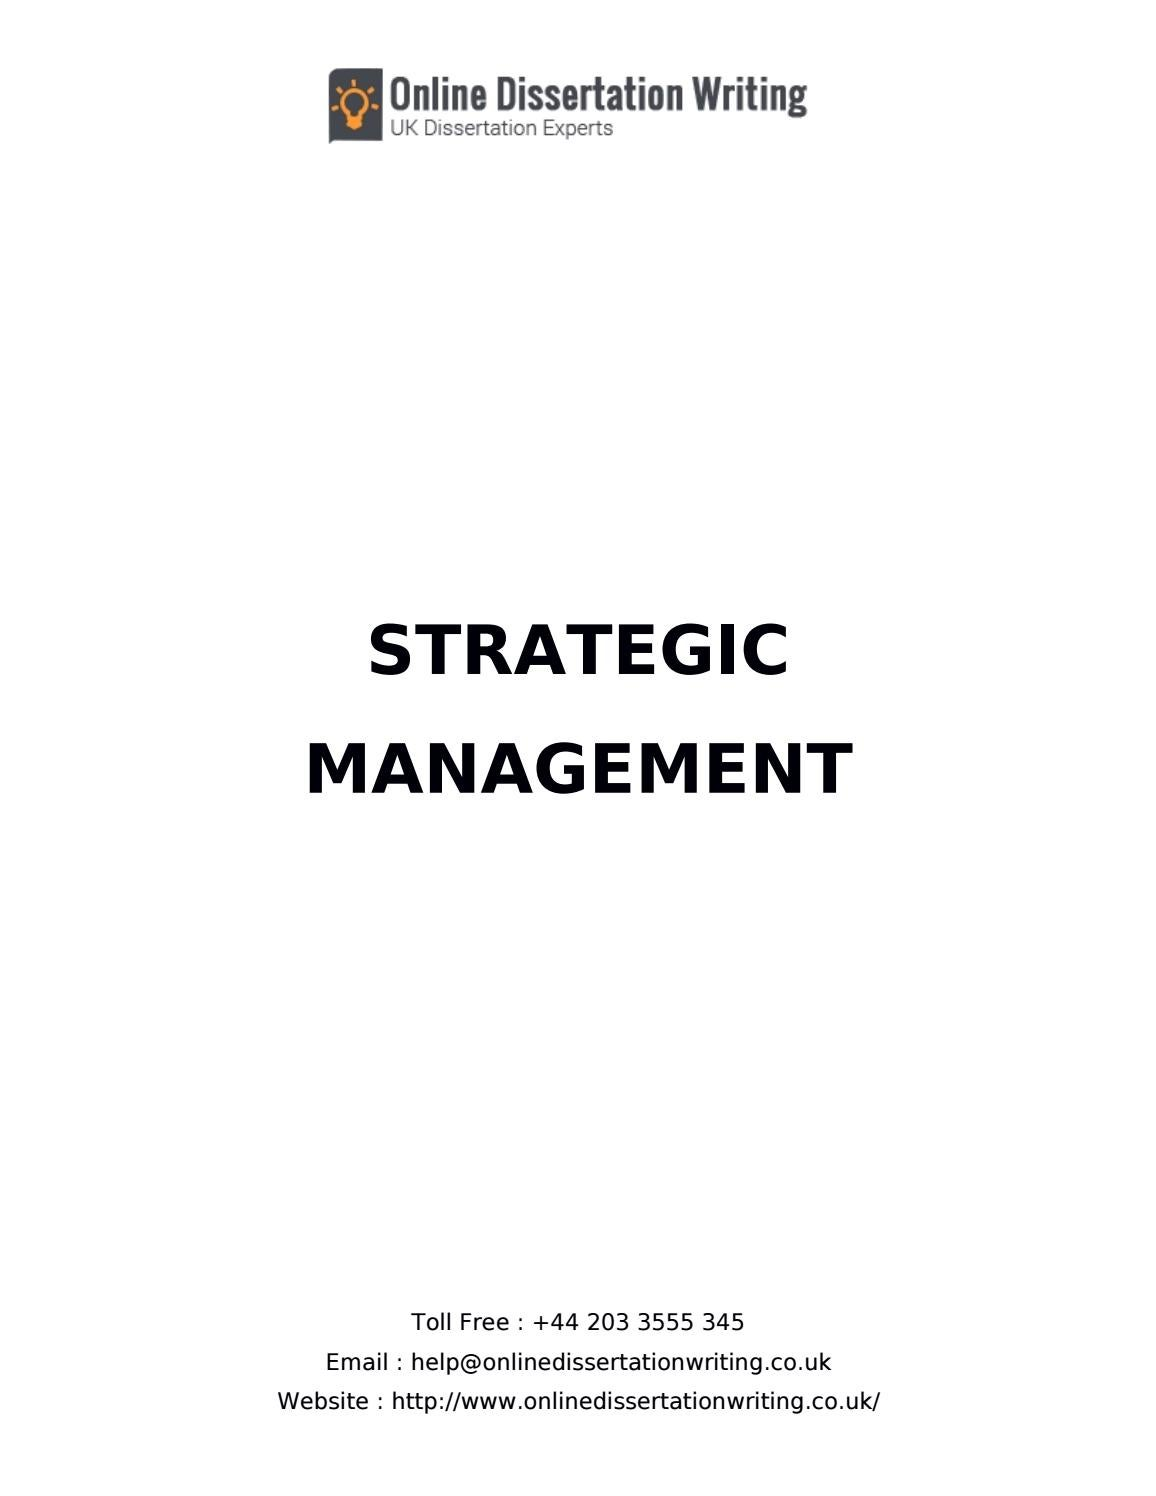 Dissertation strategic management